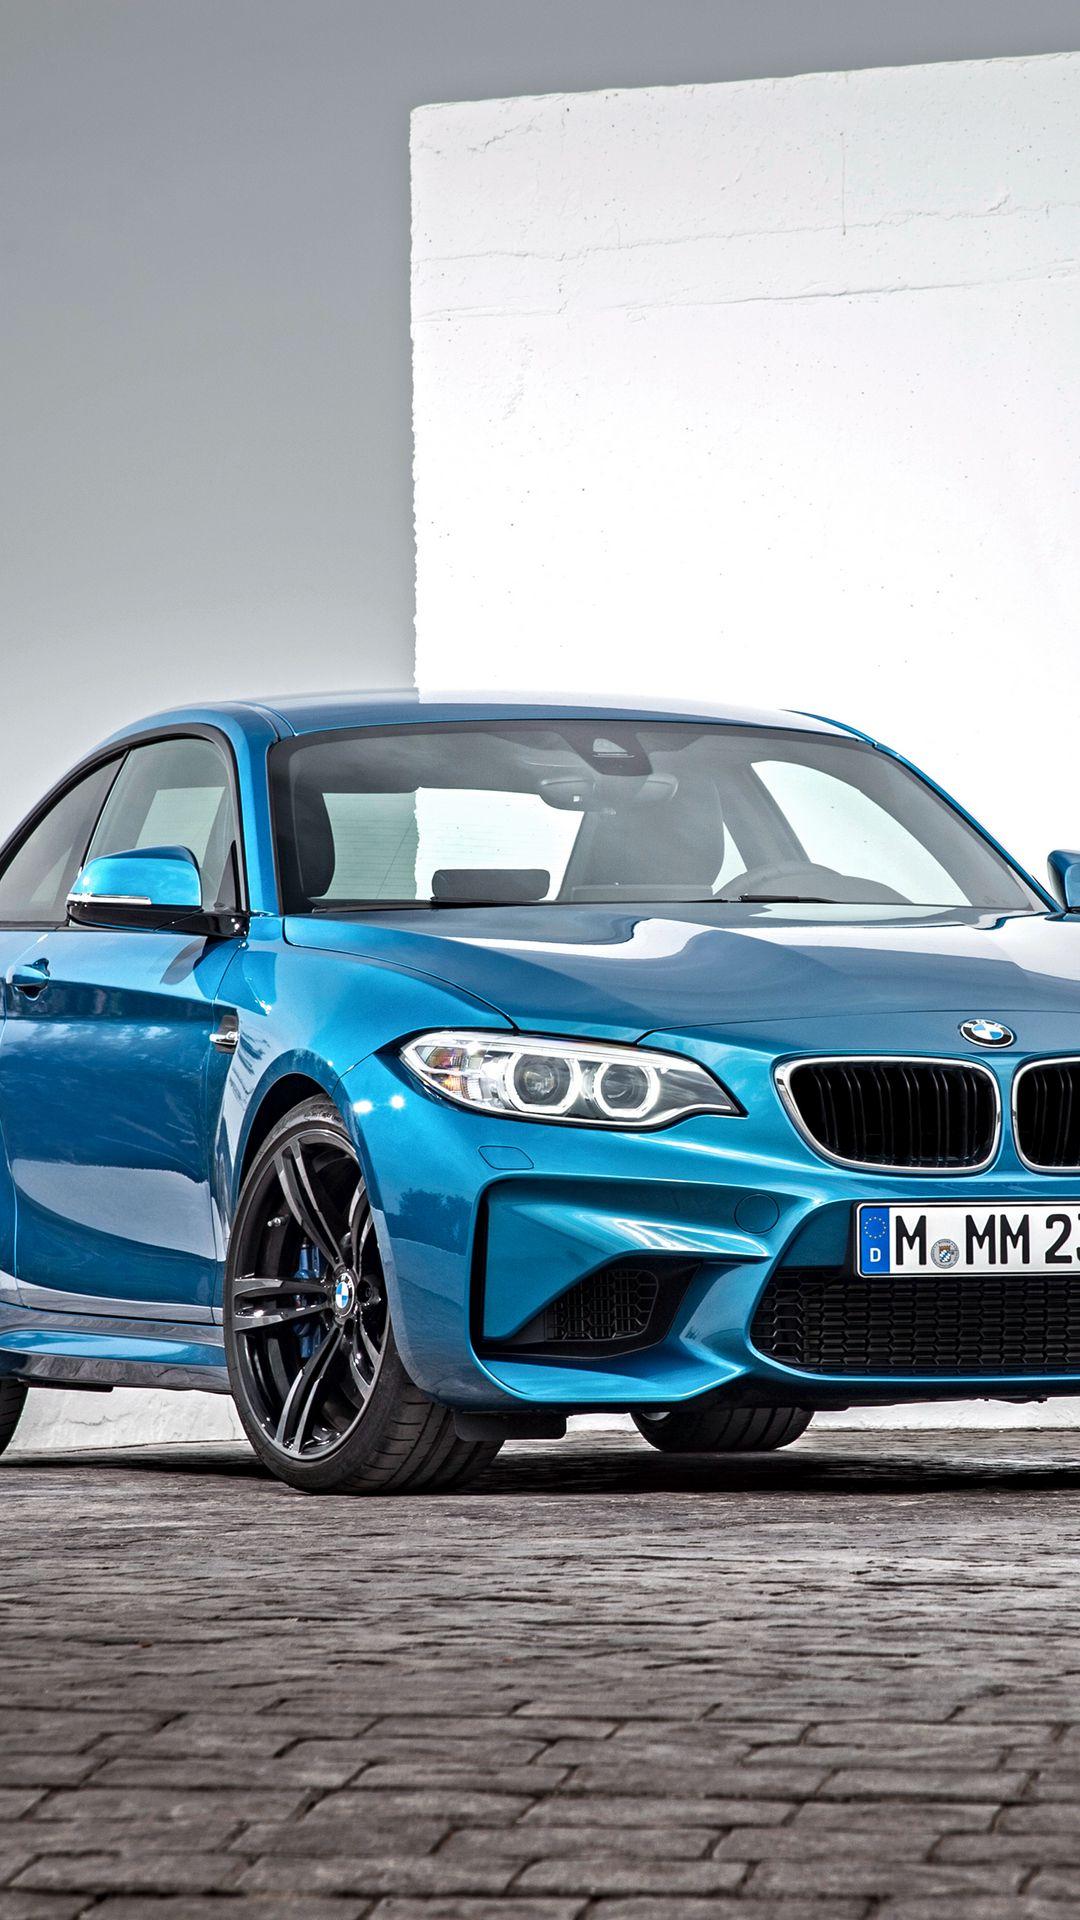 BMW M2 Series F87 Car Wallpapers Free Download